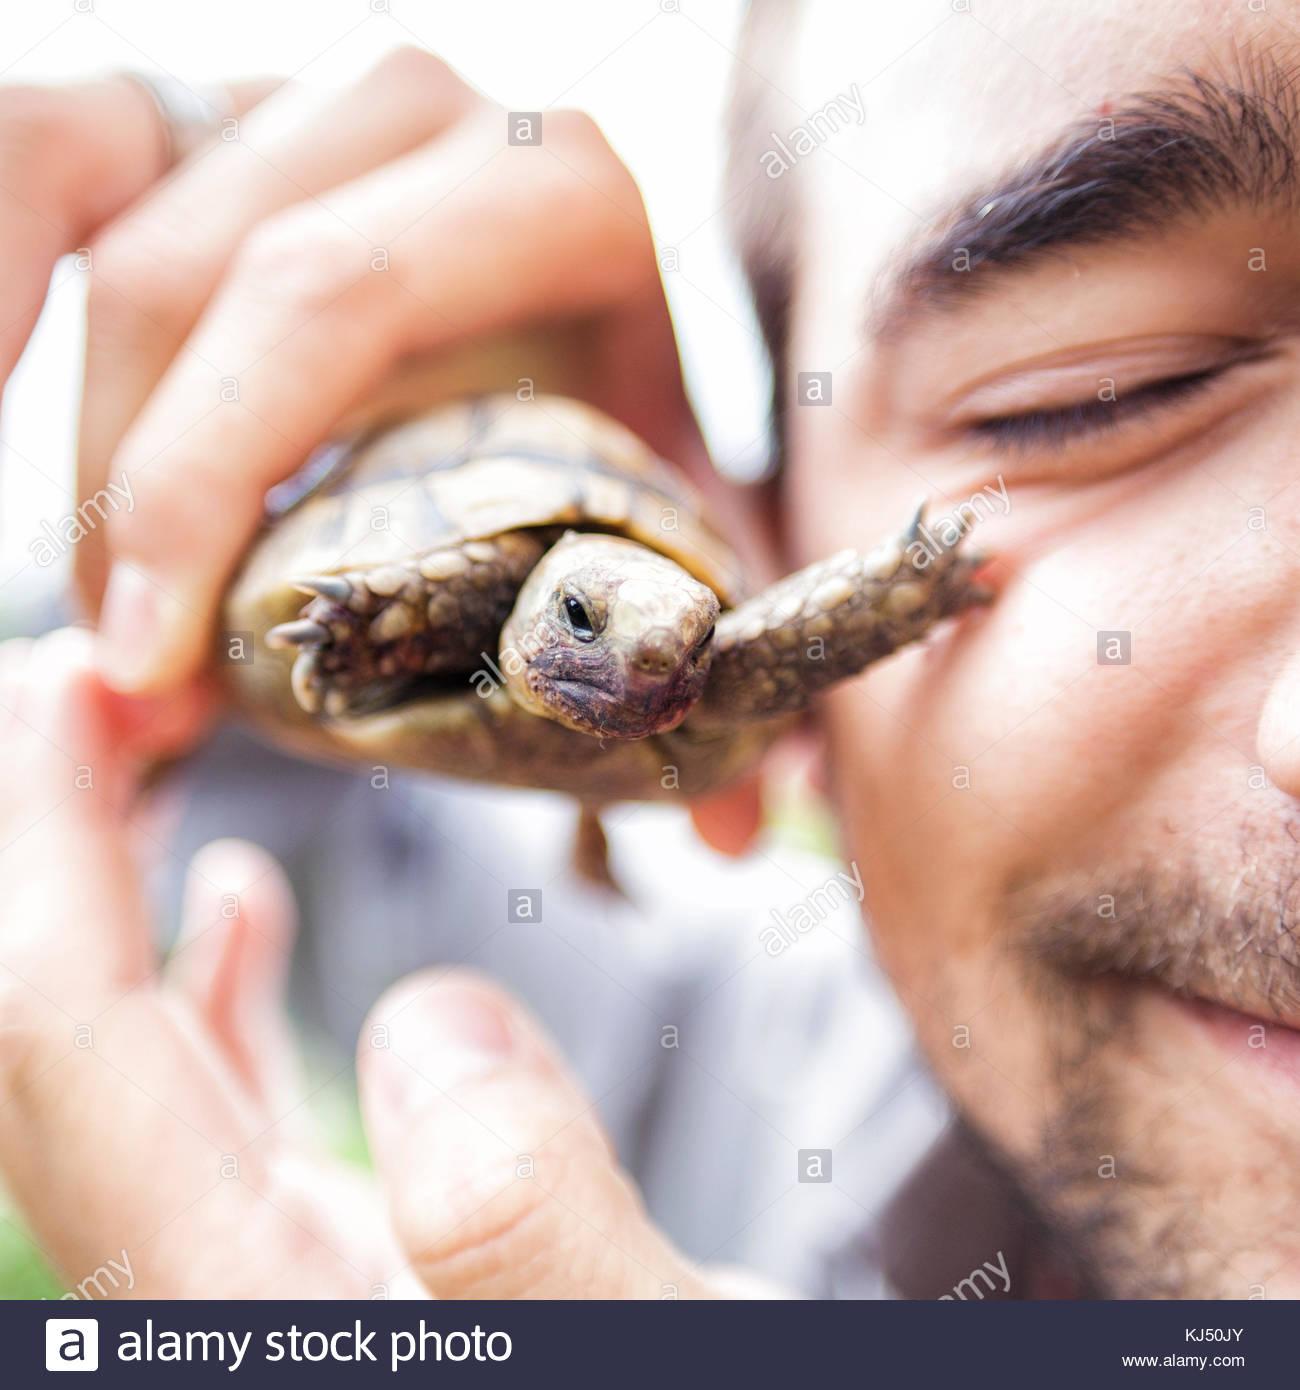 Man holding turtle - Stock Image